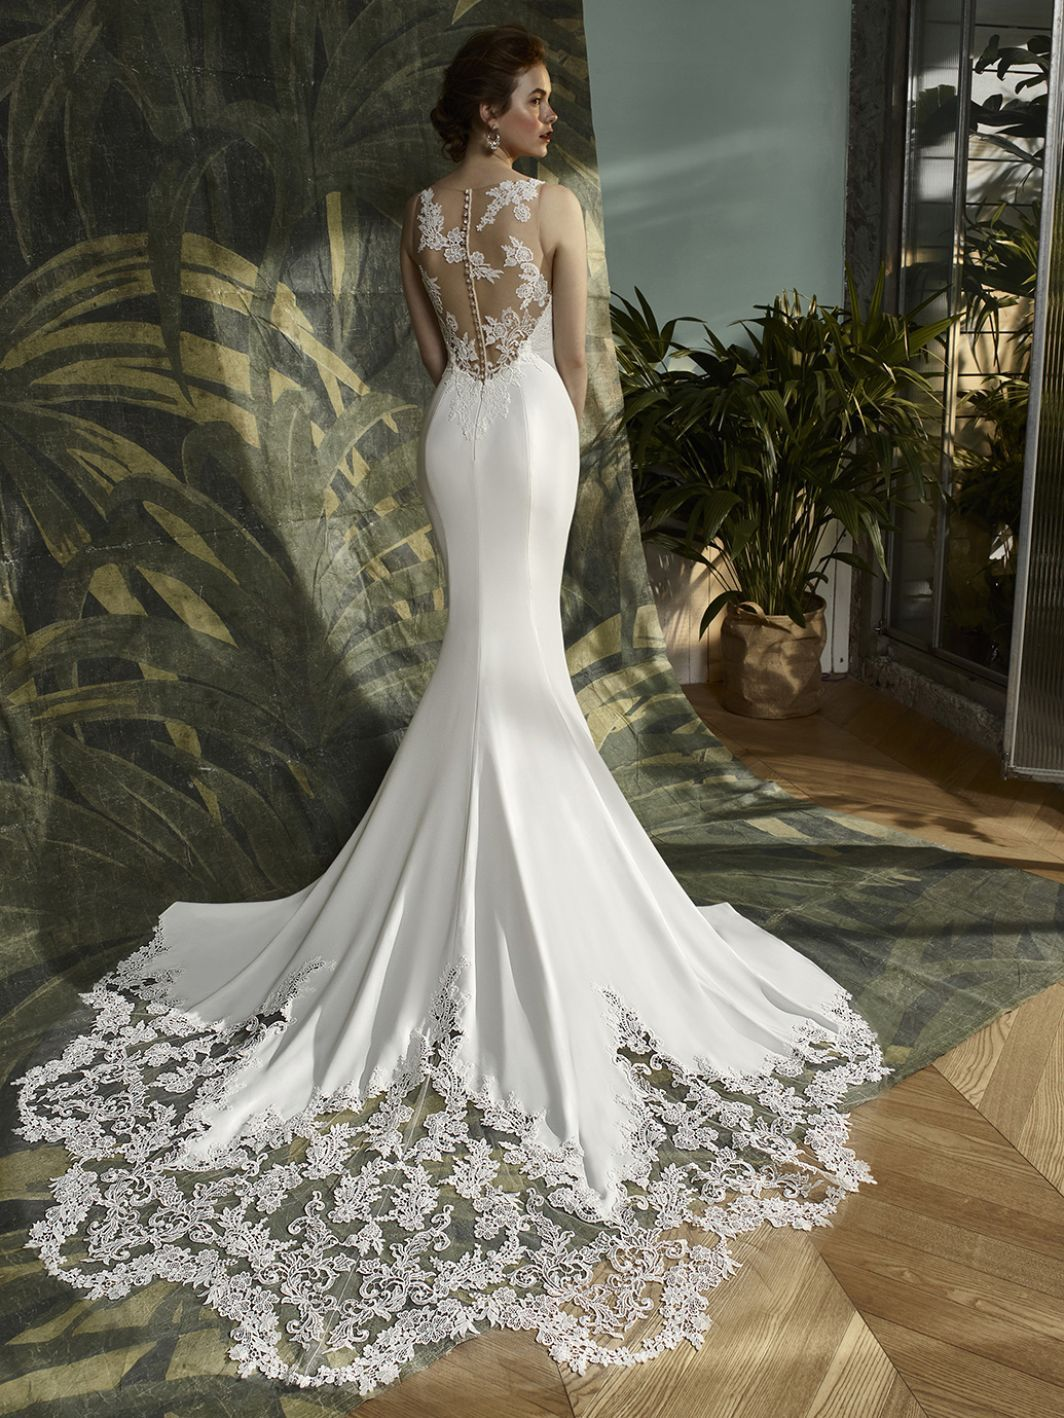 2018 Alma Novia Collection Randa Mermaid Style Crepe Georgette Wedding Dress With Long Wedding Dress Long Sleeve Trendy Wedding Dresses Wedding Dresses Simple [ 1920 x 1536 Pixel ]